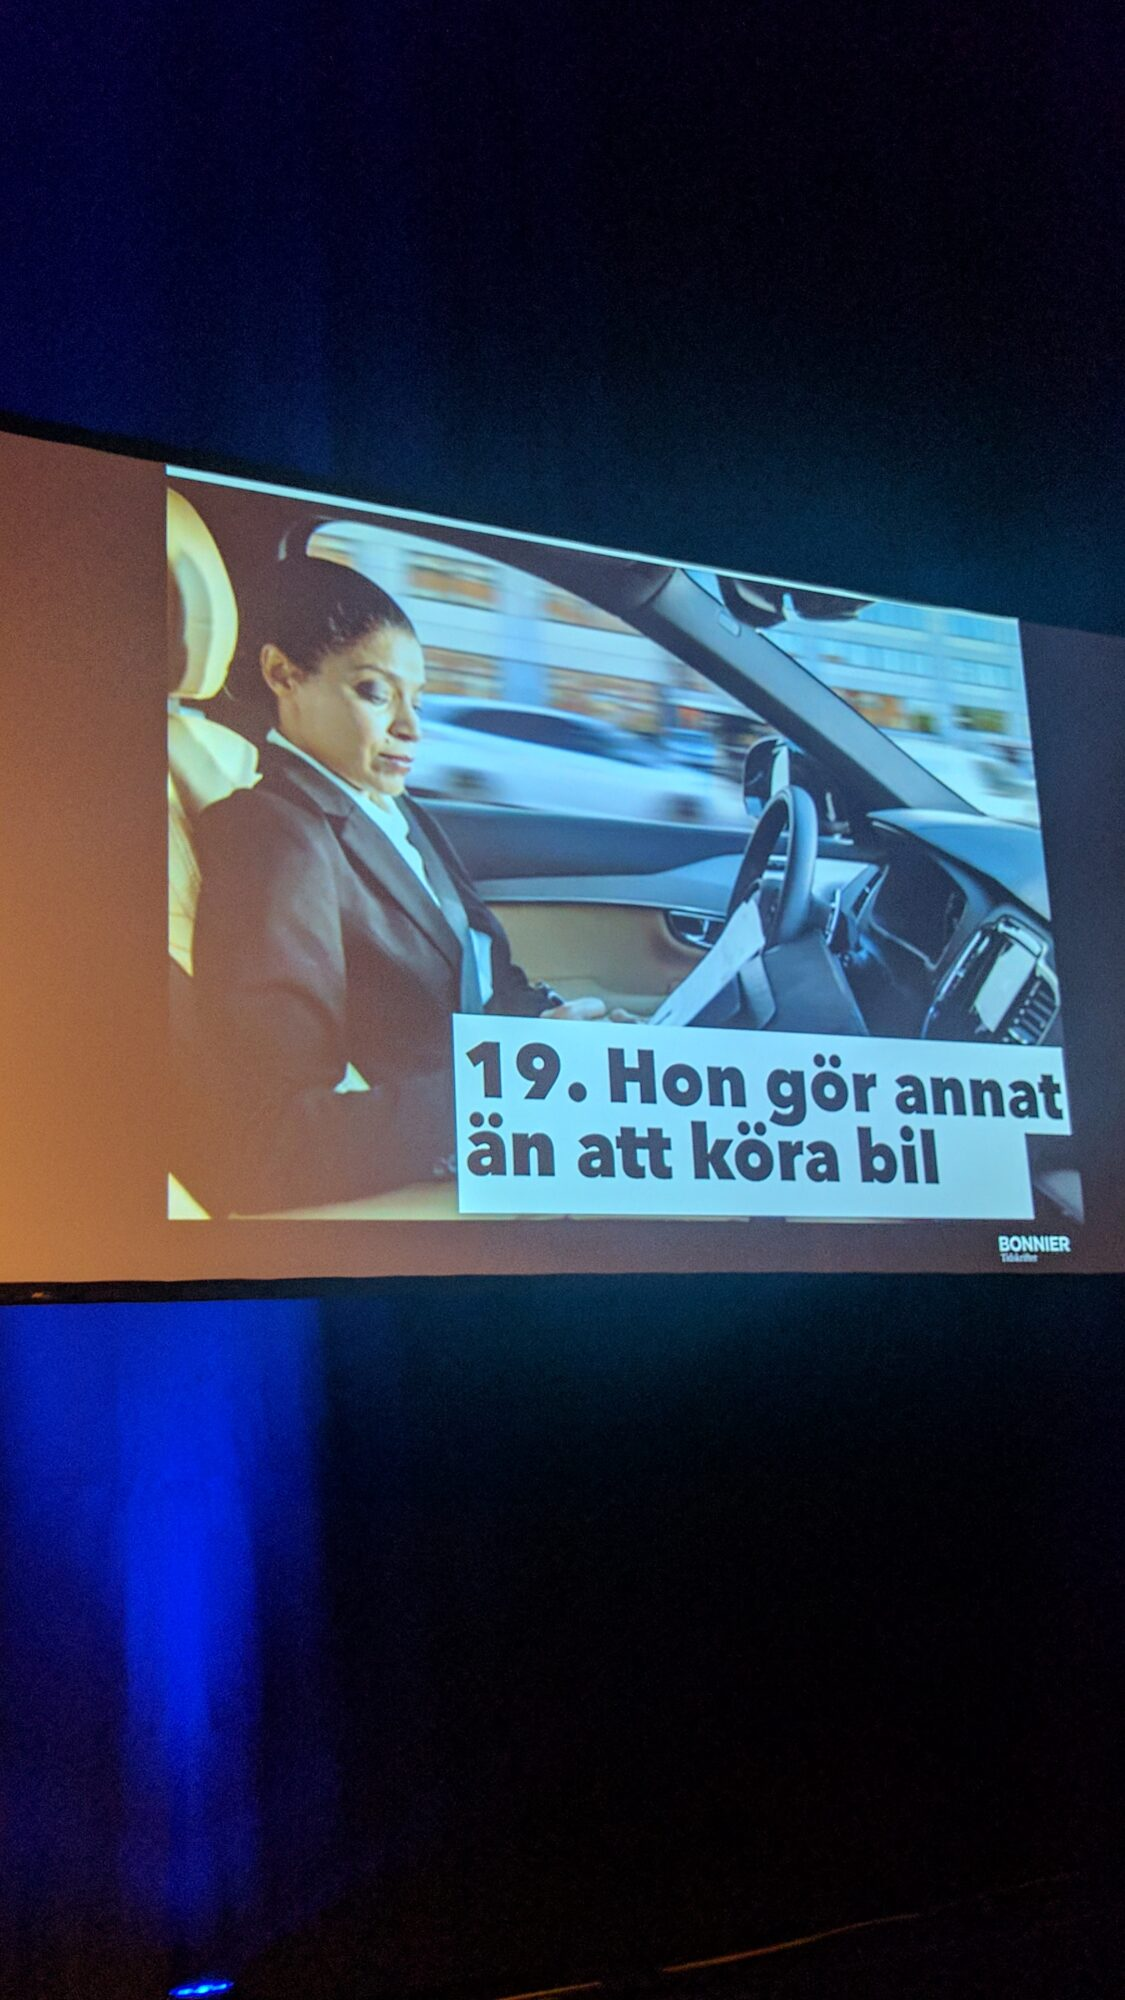 IT-Kanalen.se